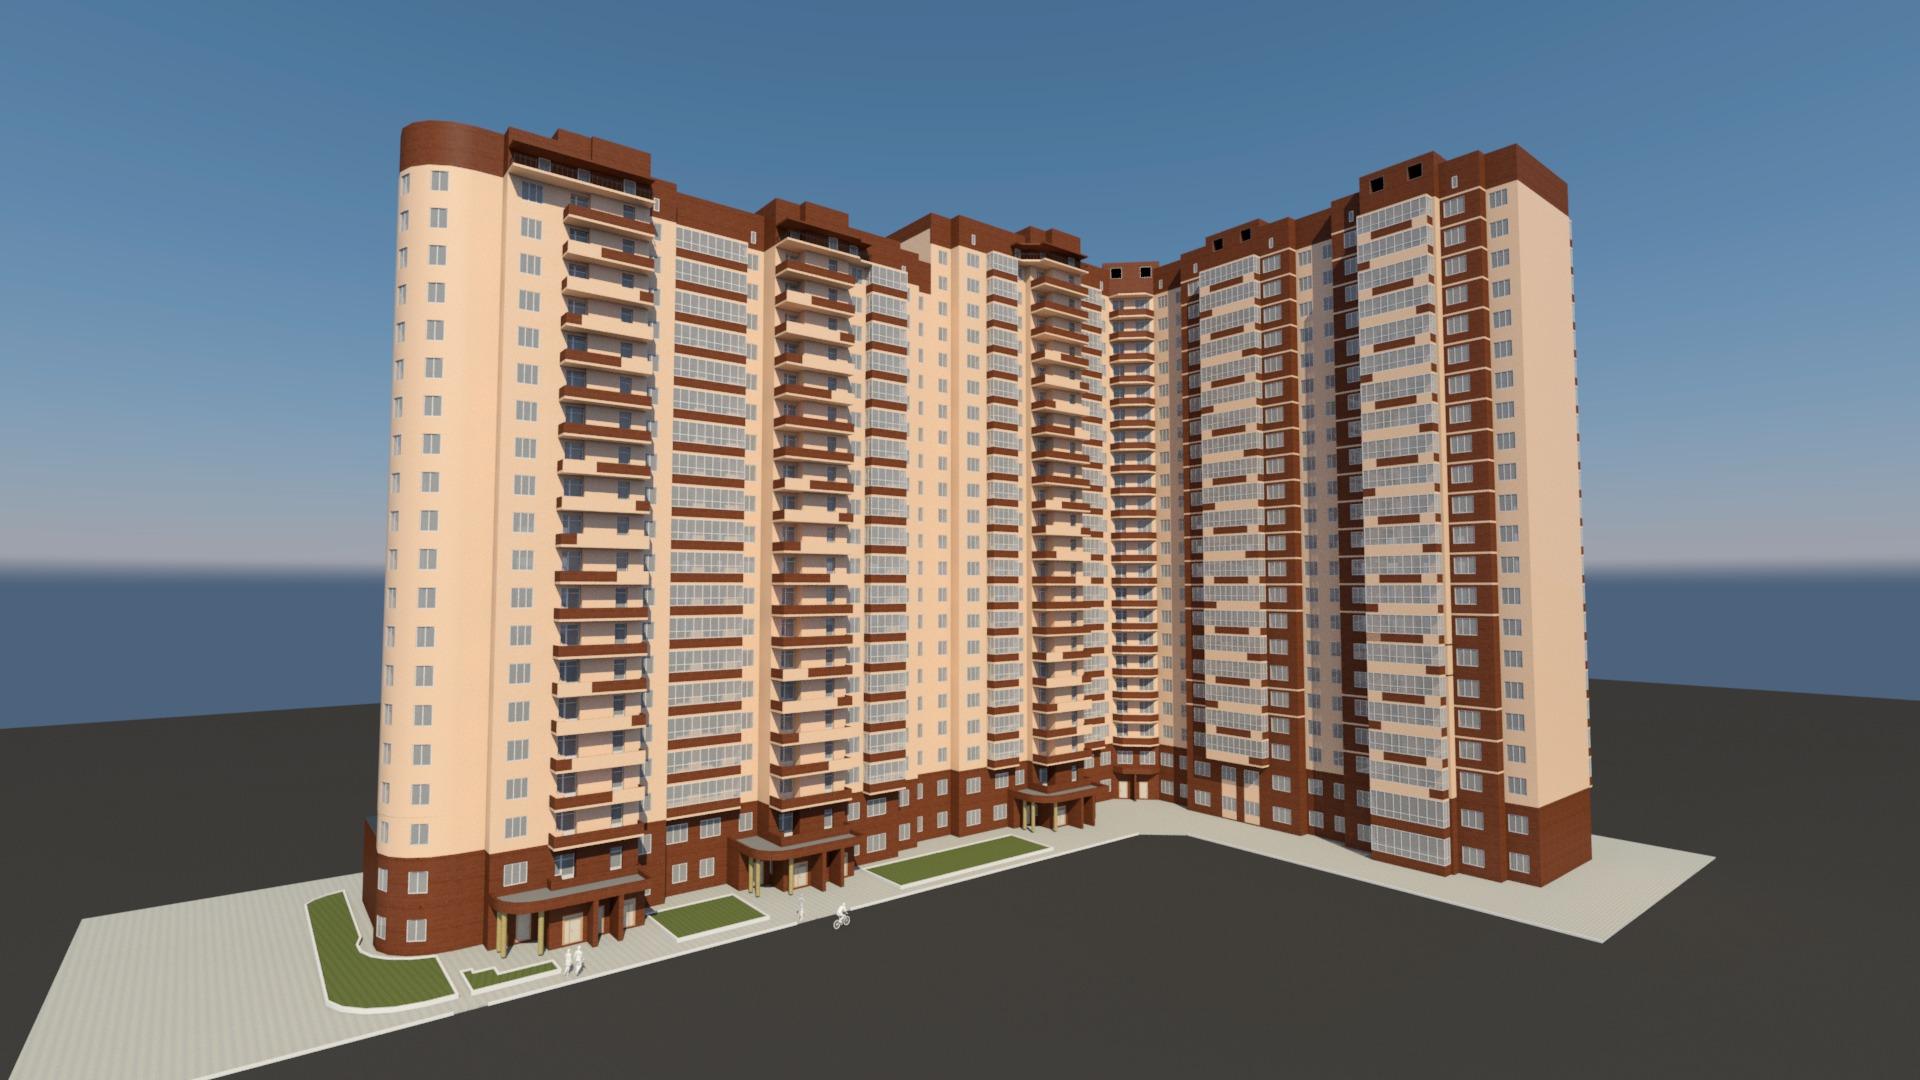 Raas-rendering20140910-2778-3qdqf3